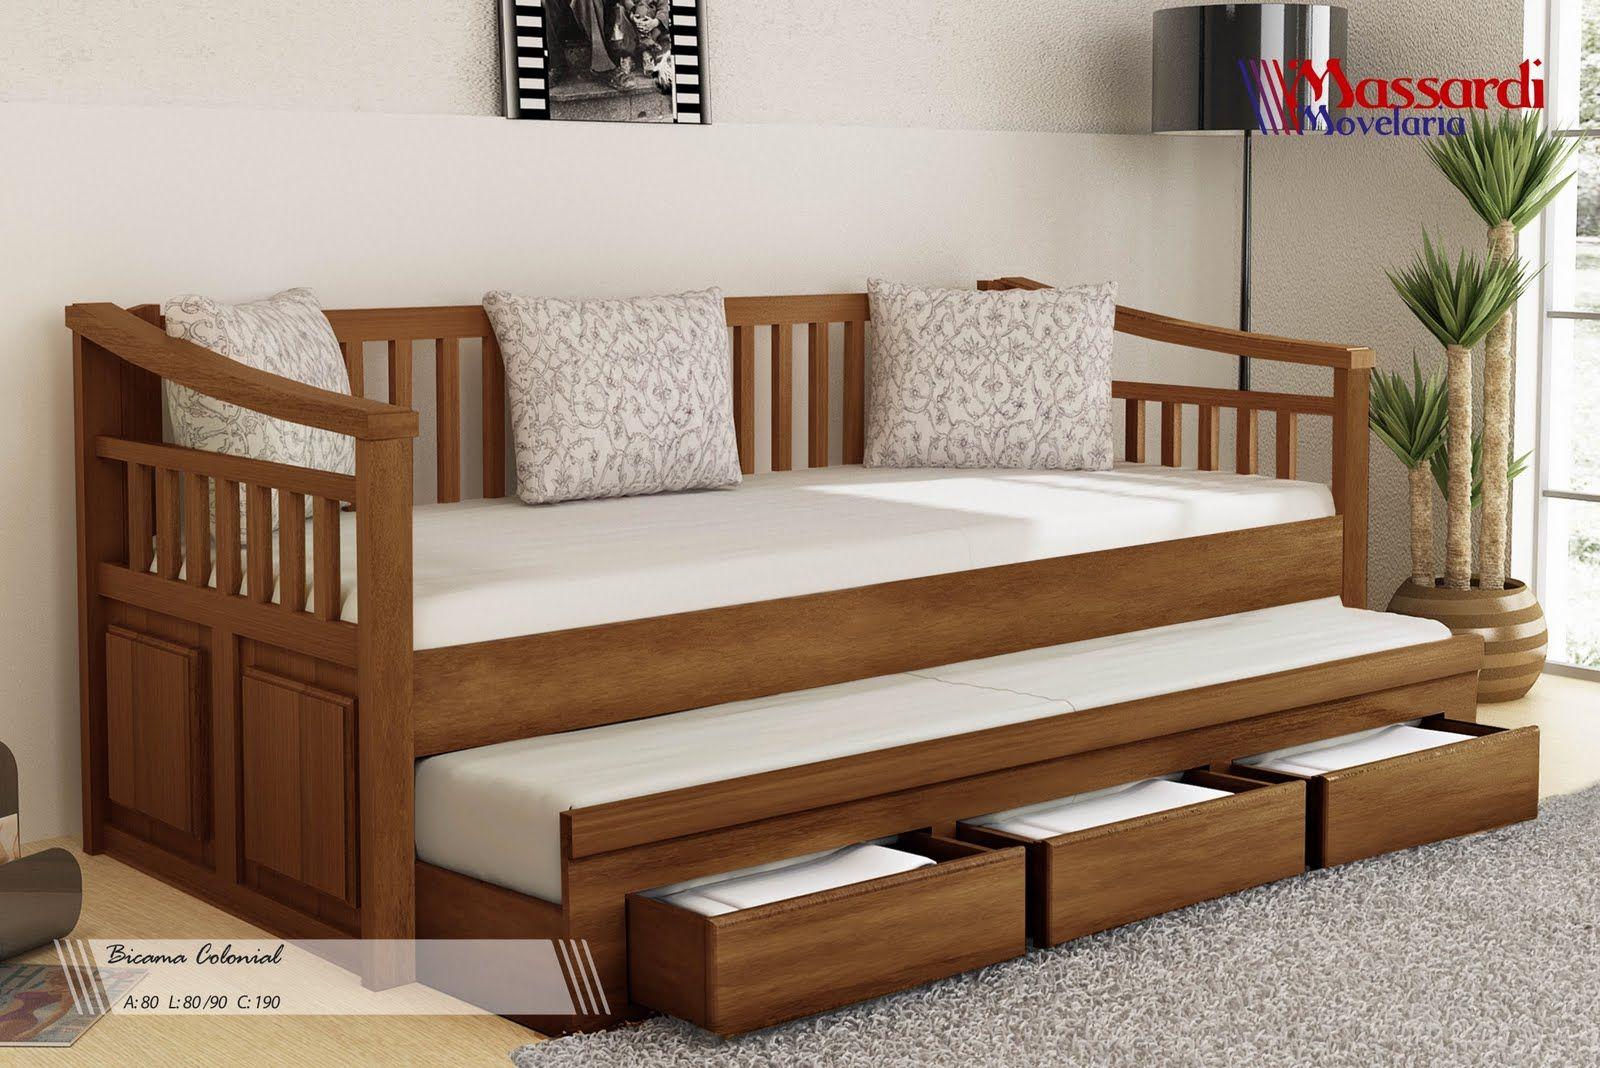 Bicama 2 m veis pinterest camas sof s cama y for Camas divan juveniles